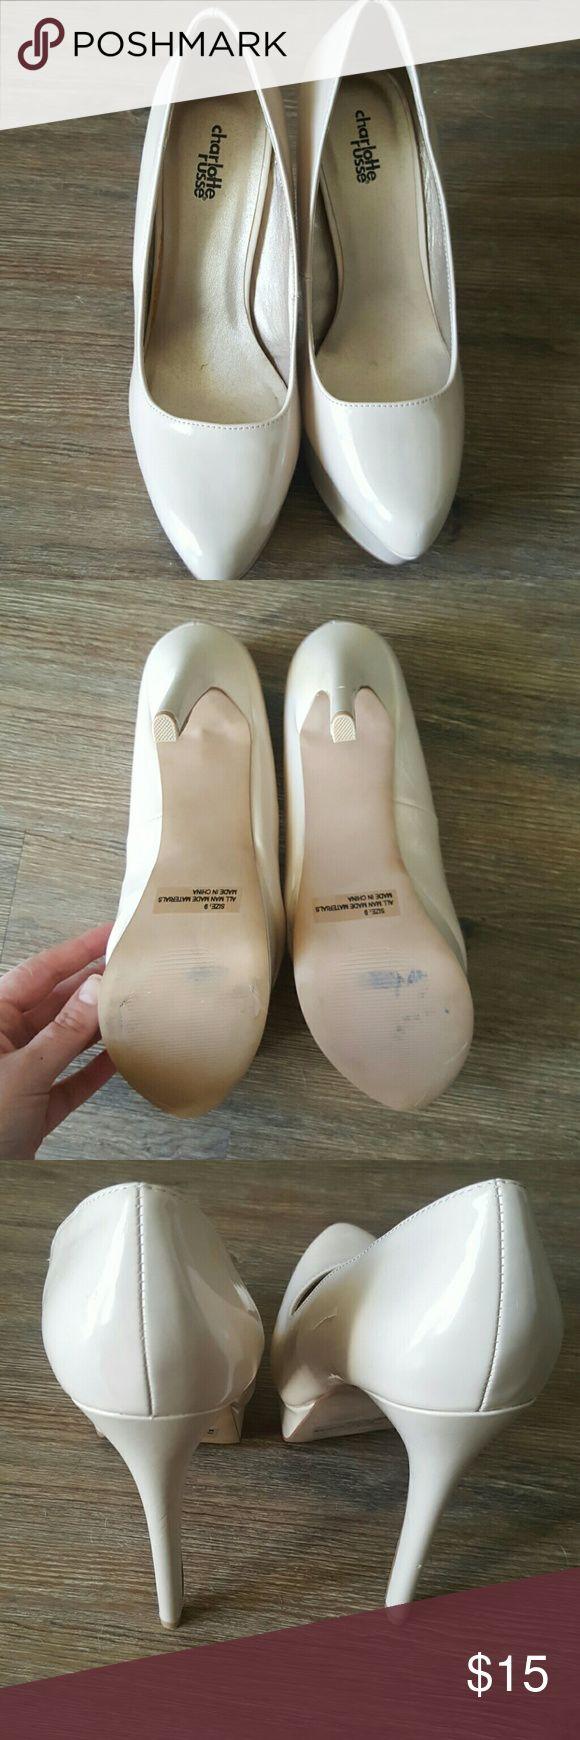 Charlotte Russe Tan Heels Charlotte Rouse tan heels. Never worn outside Charlotte Russe Shoes Heels